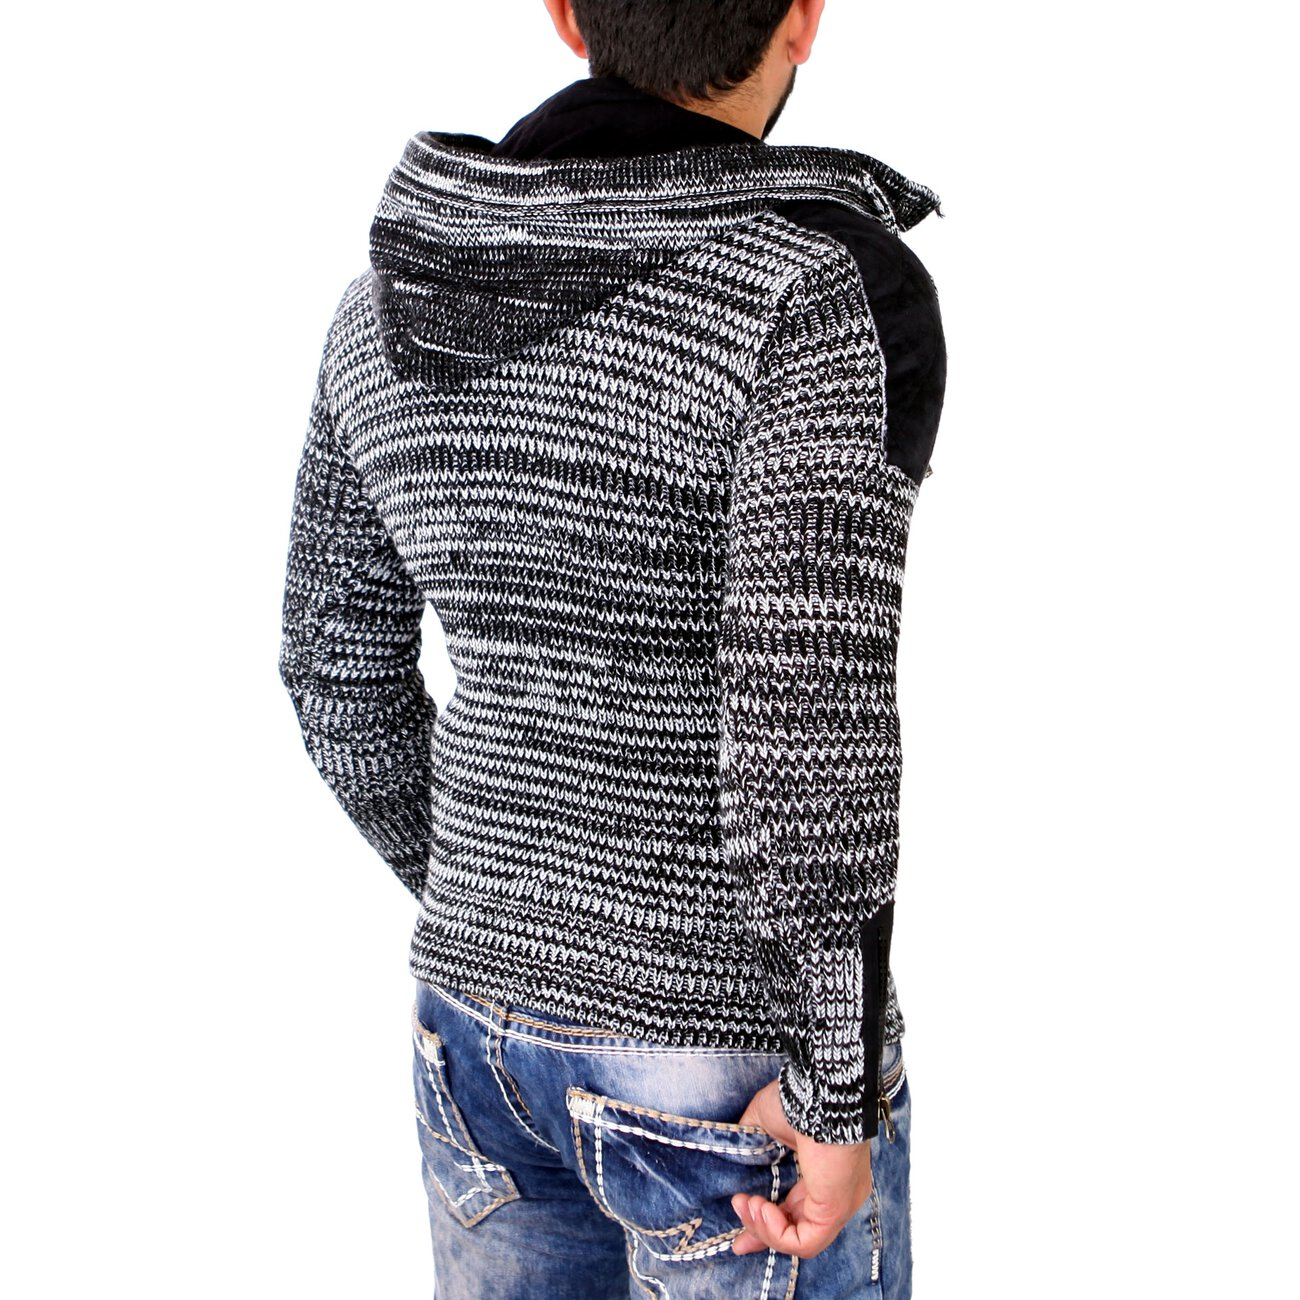 tazzio strickpullover herren winter grobstrick kapuzen pullover tz 45. Black Bedroom Furniture Sets. Home Design Ideas